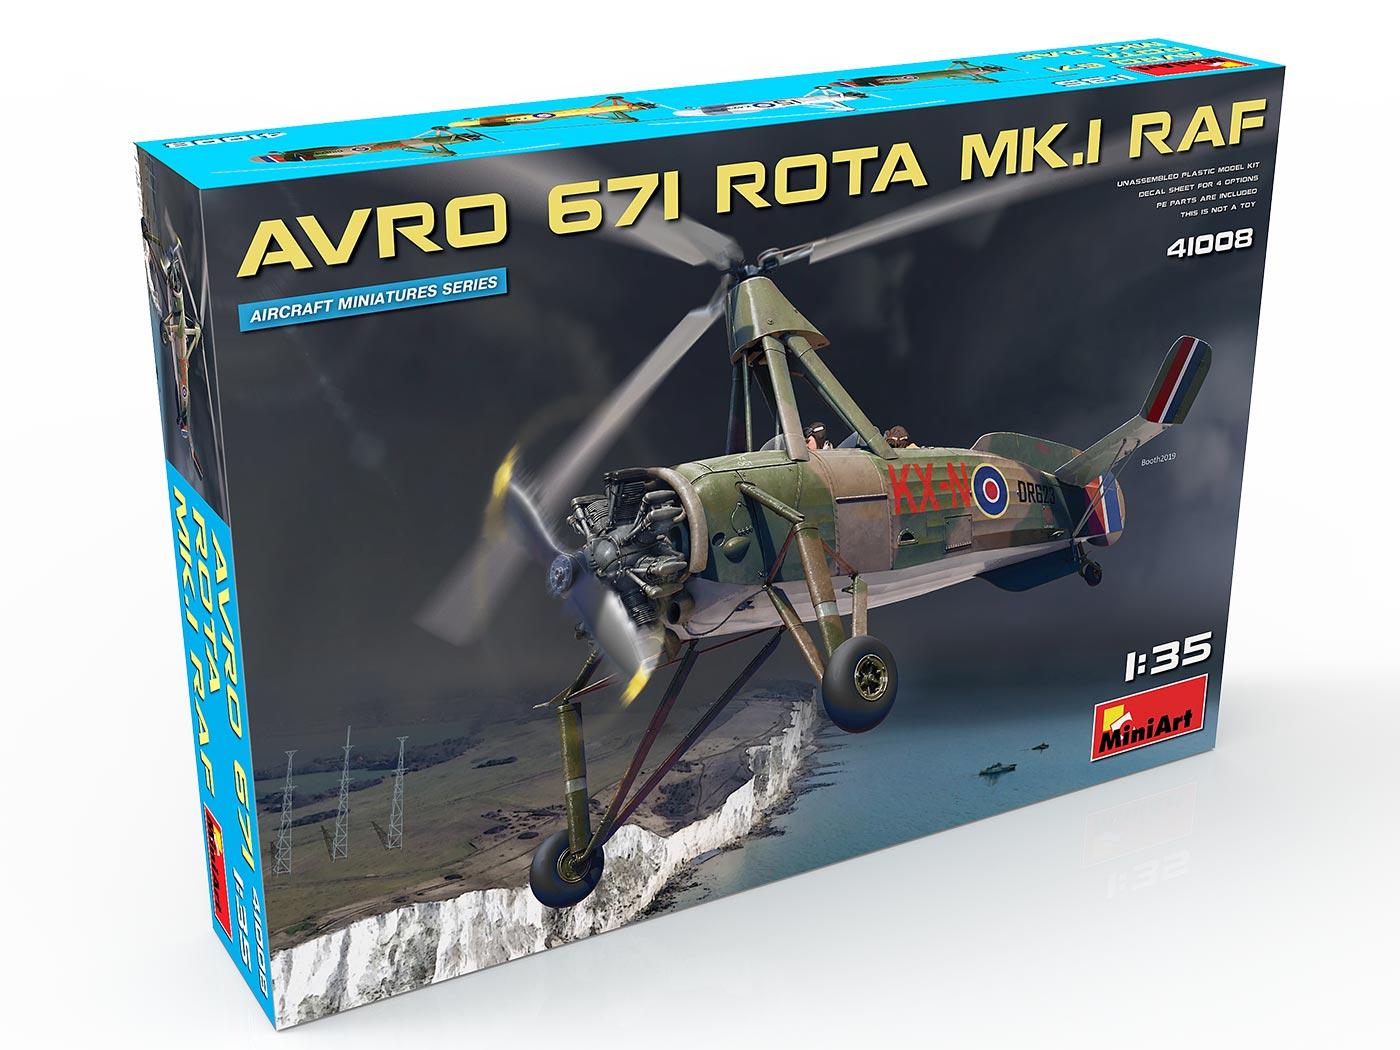 New 3D Renders of Kit: 41008 AVRO 671 ROTA MK.I RAF